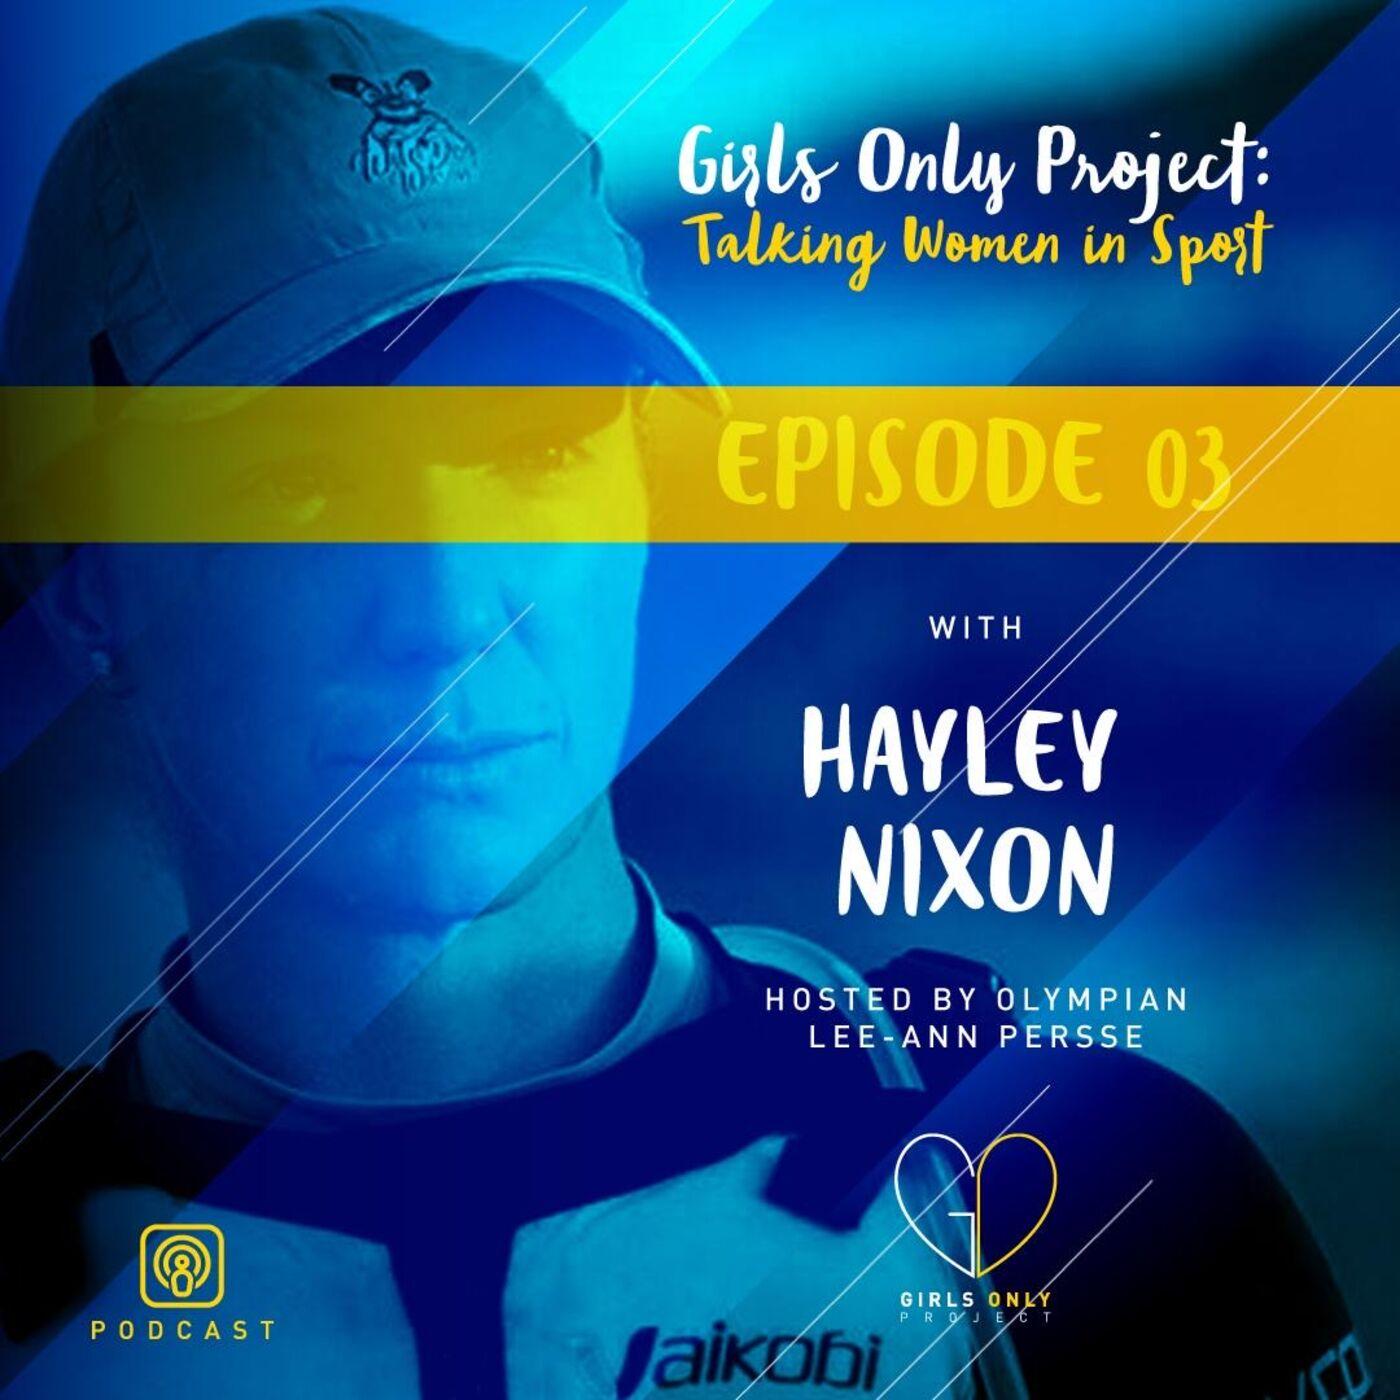 Hayley Nixon